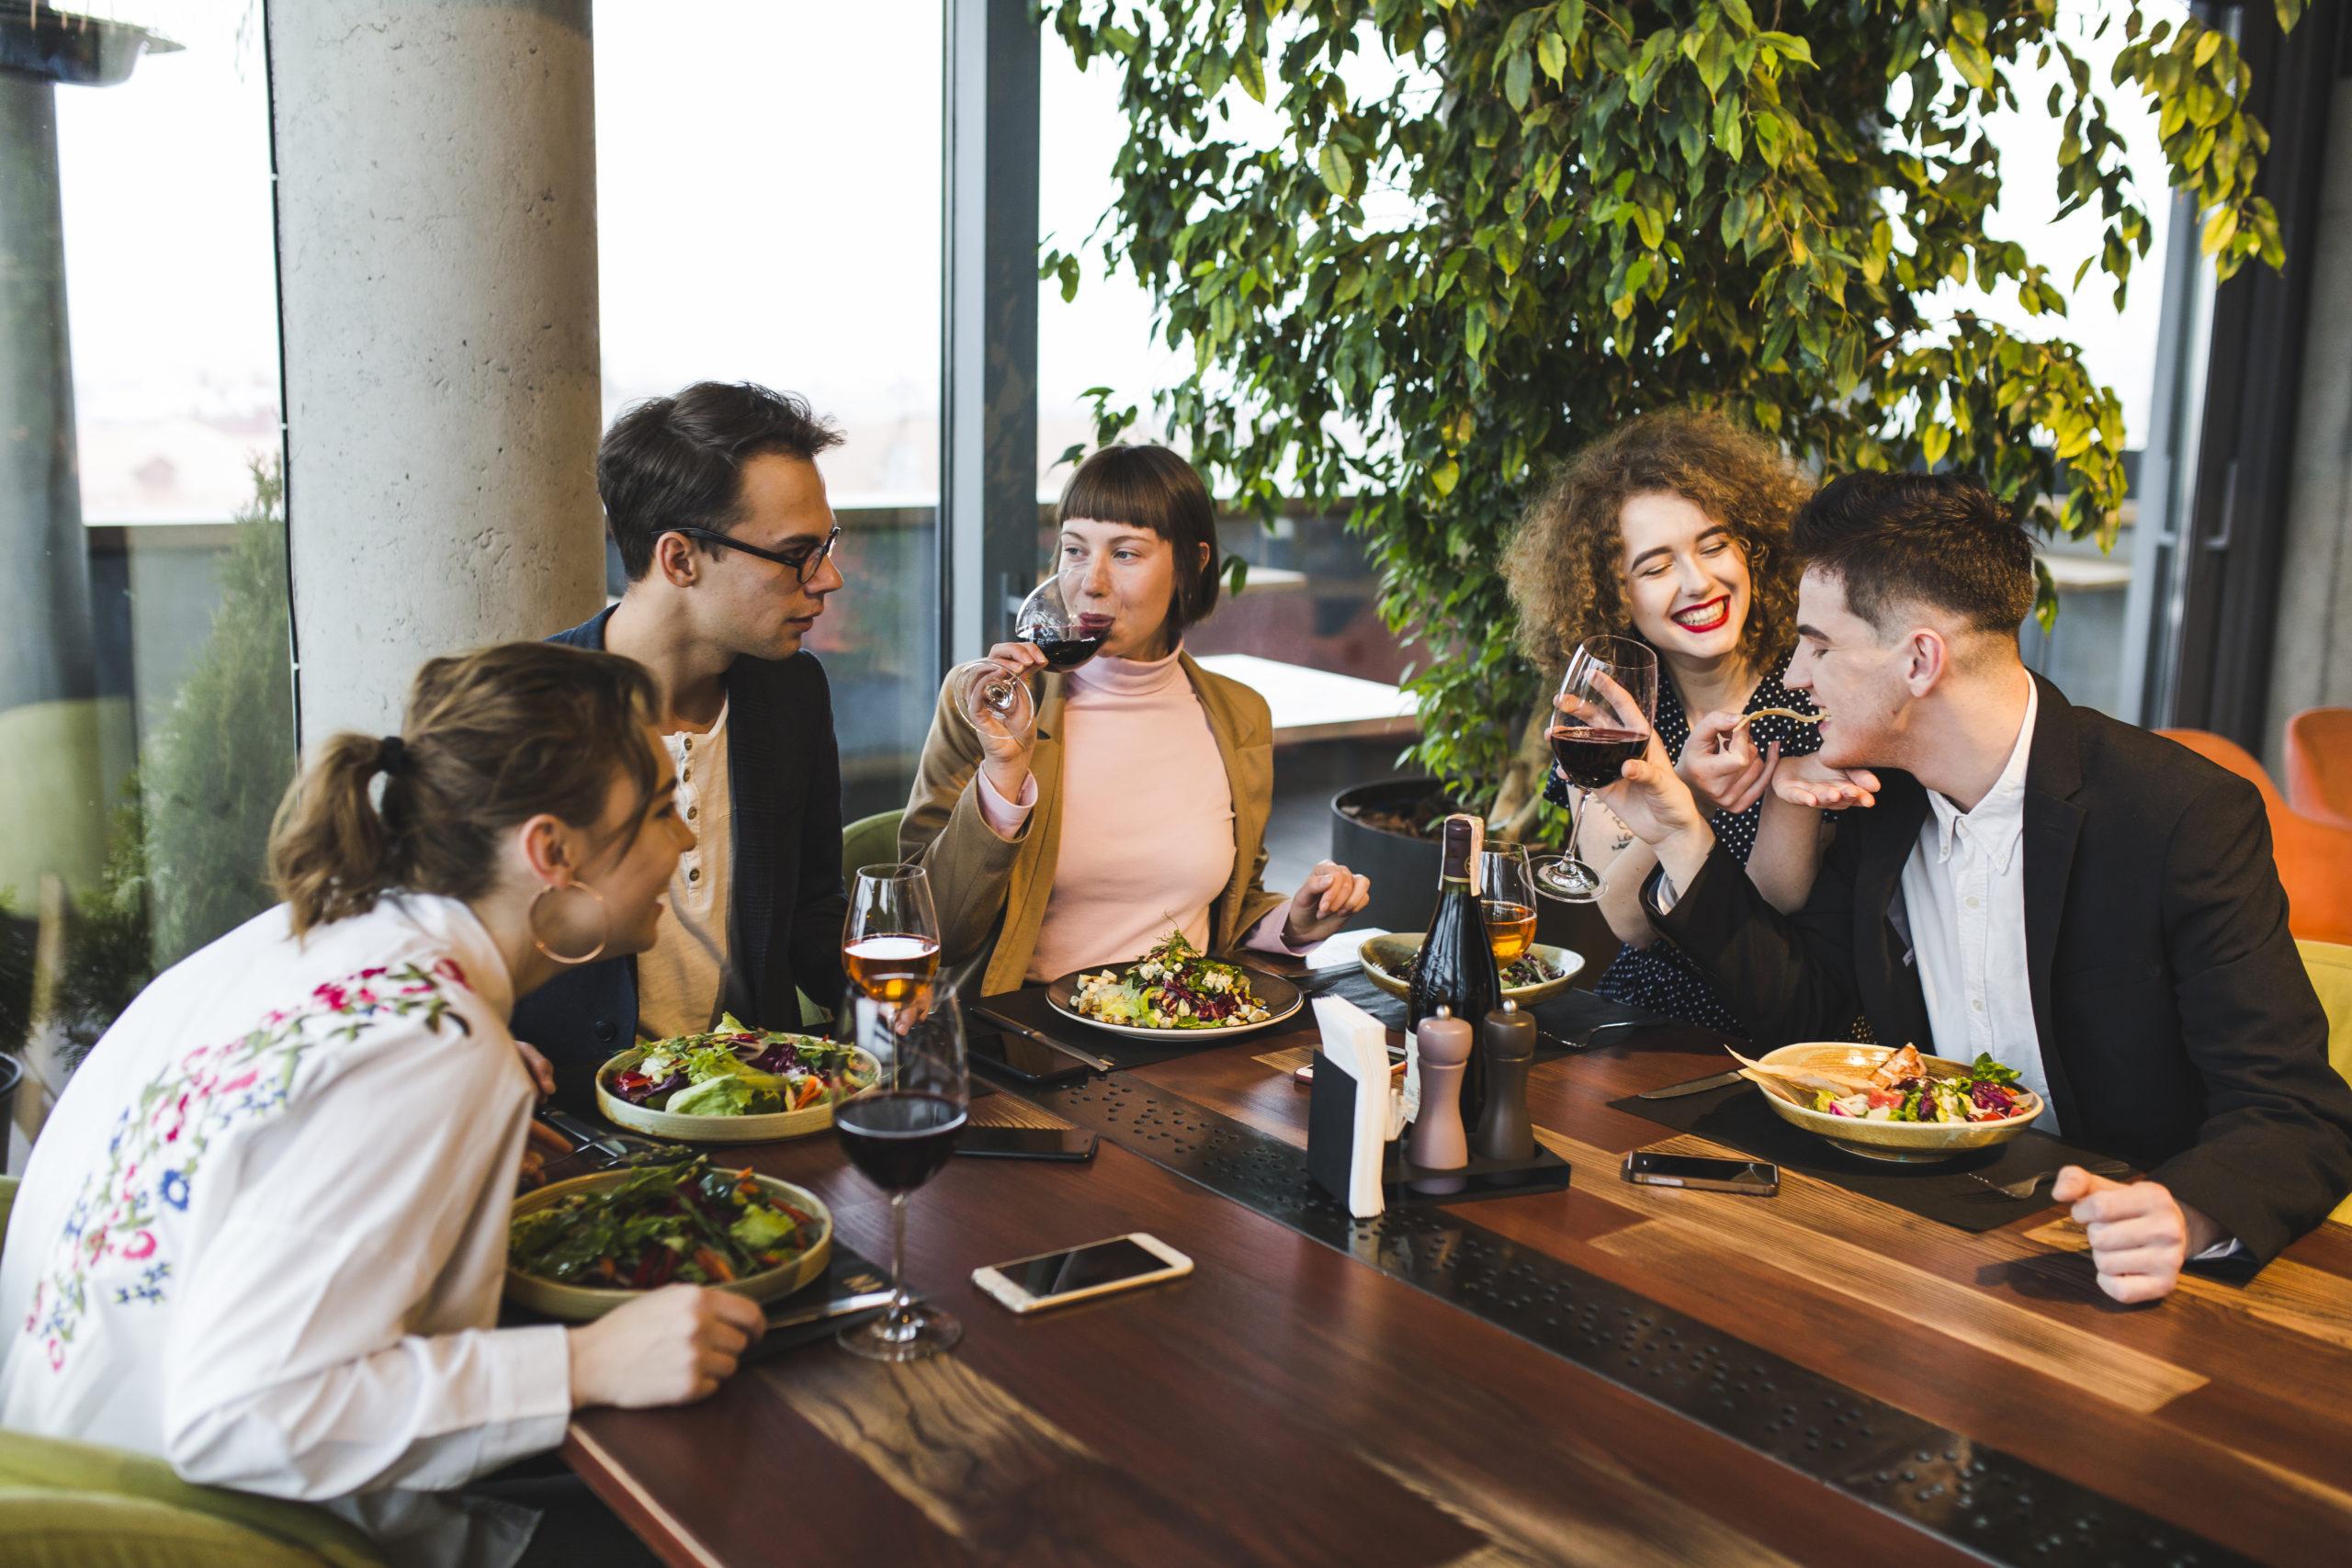 The restaurant customer experience